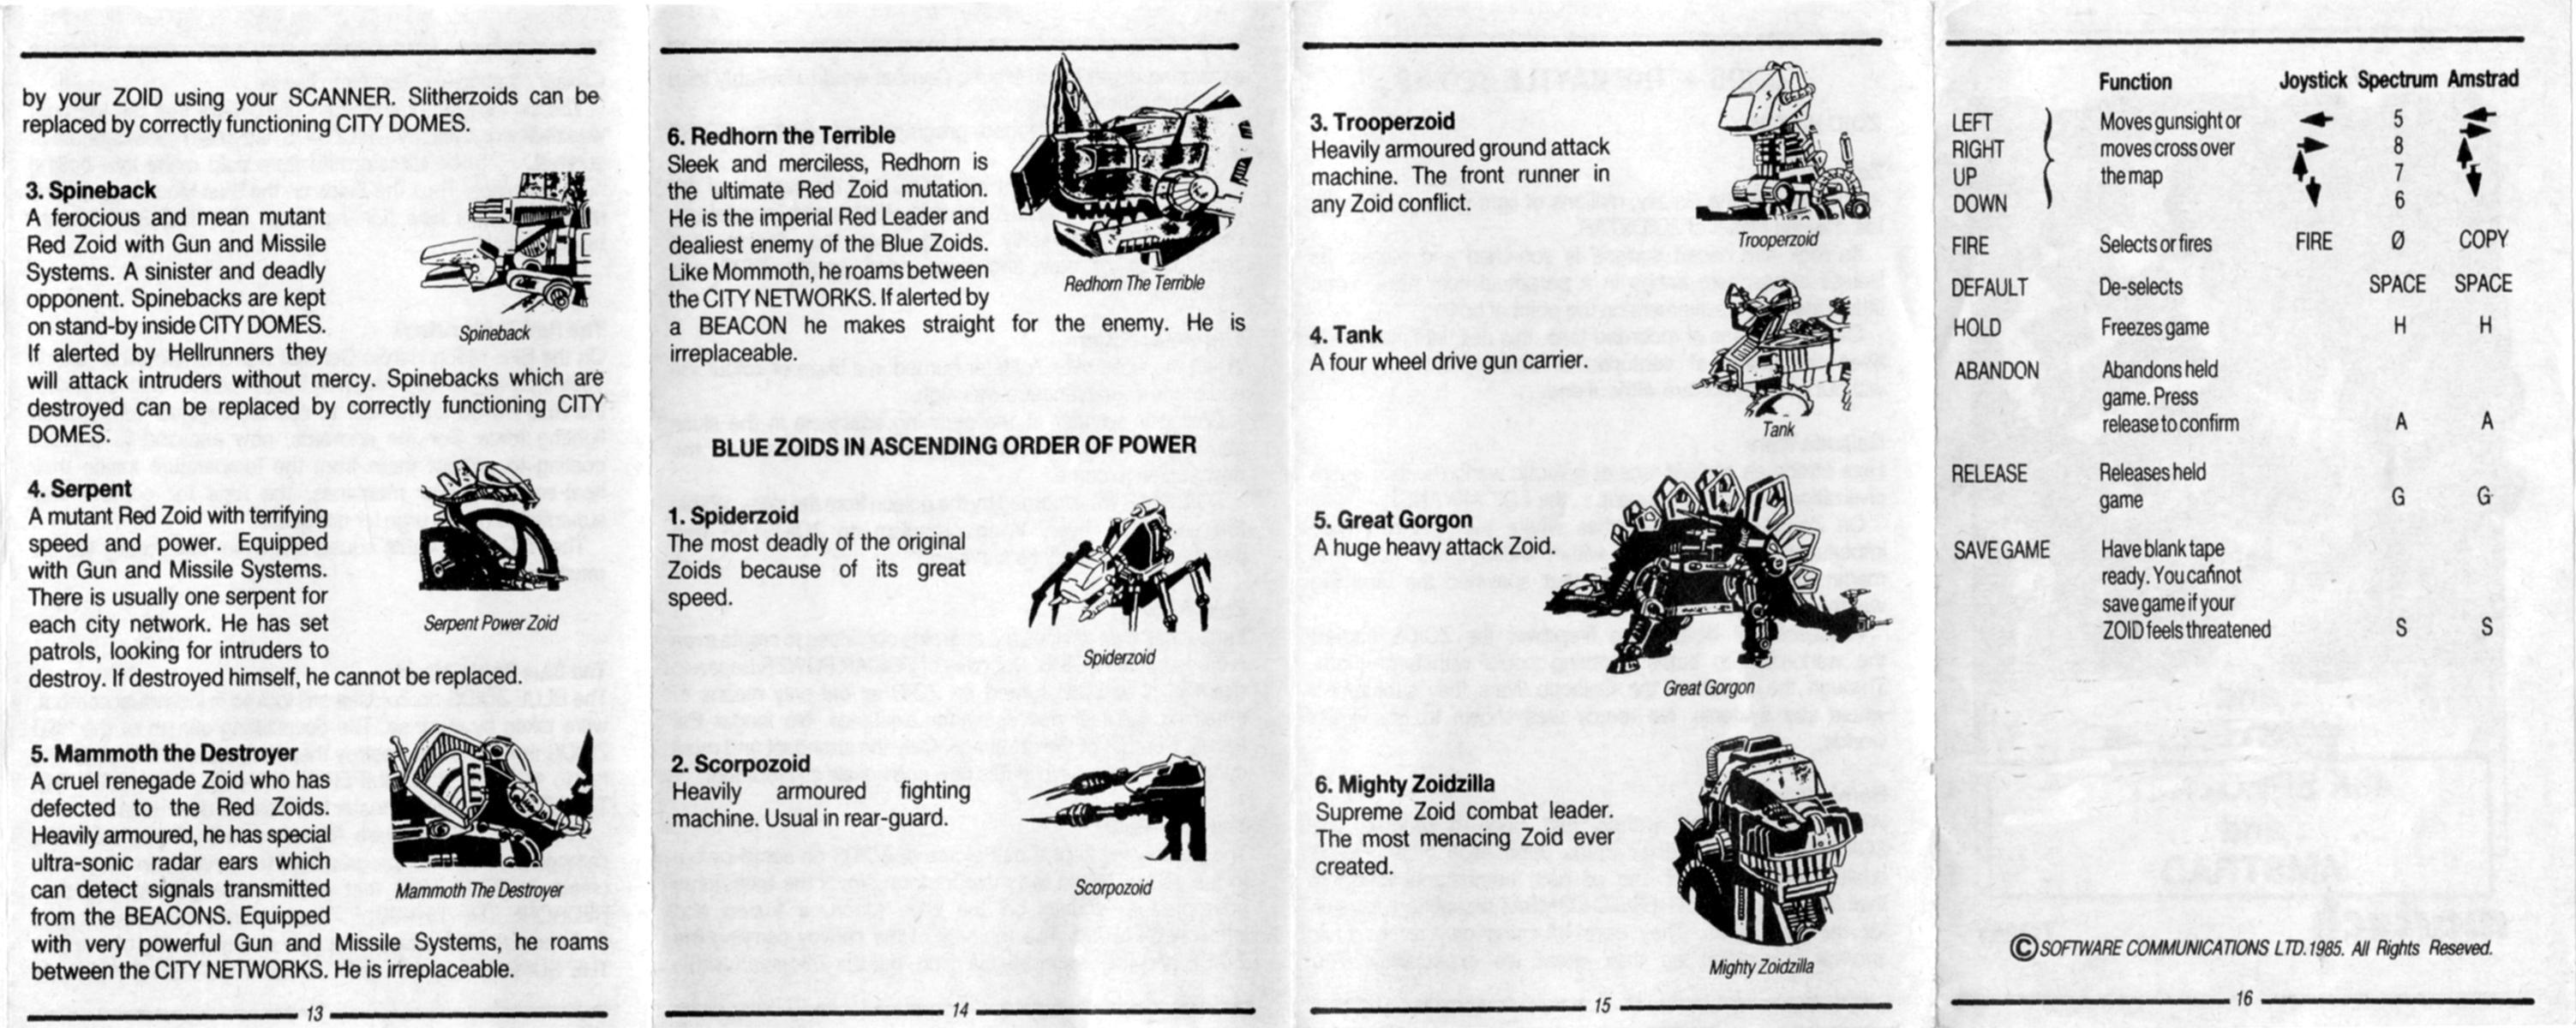 Zoids - The Battle Begins (1985, MSX, Martech Games